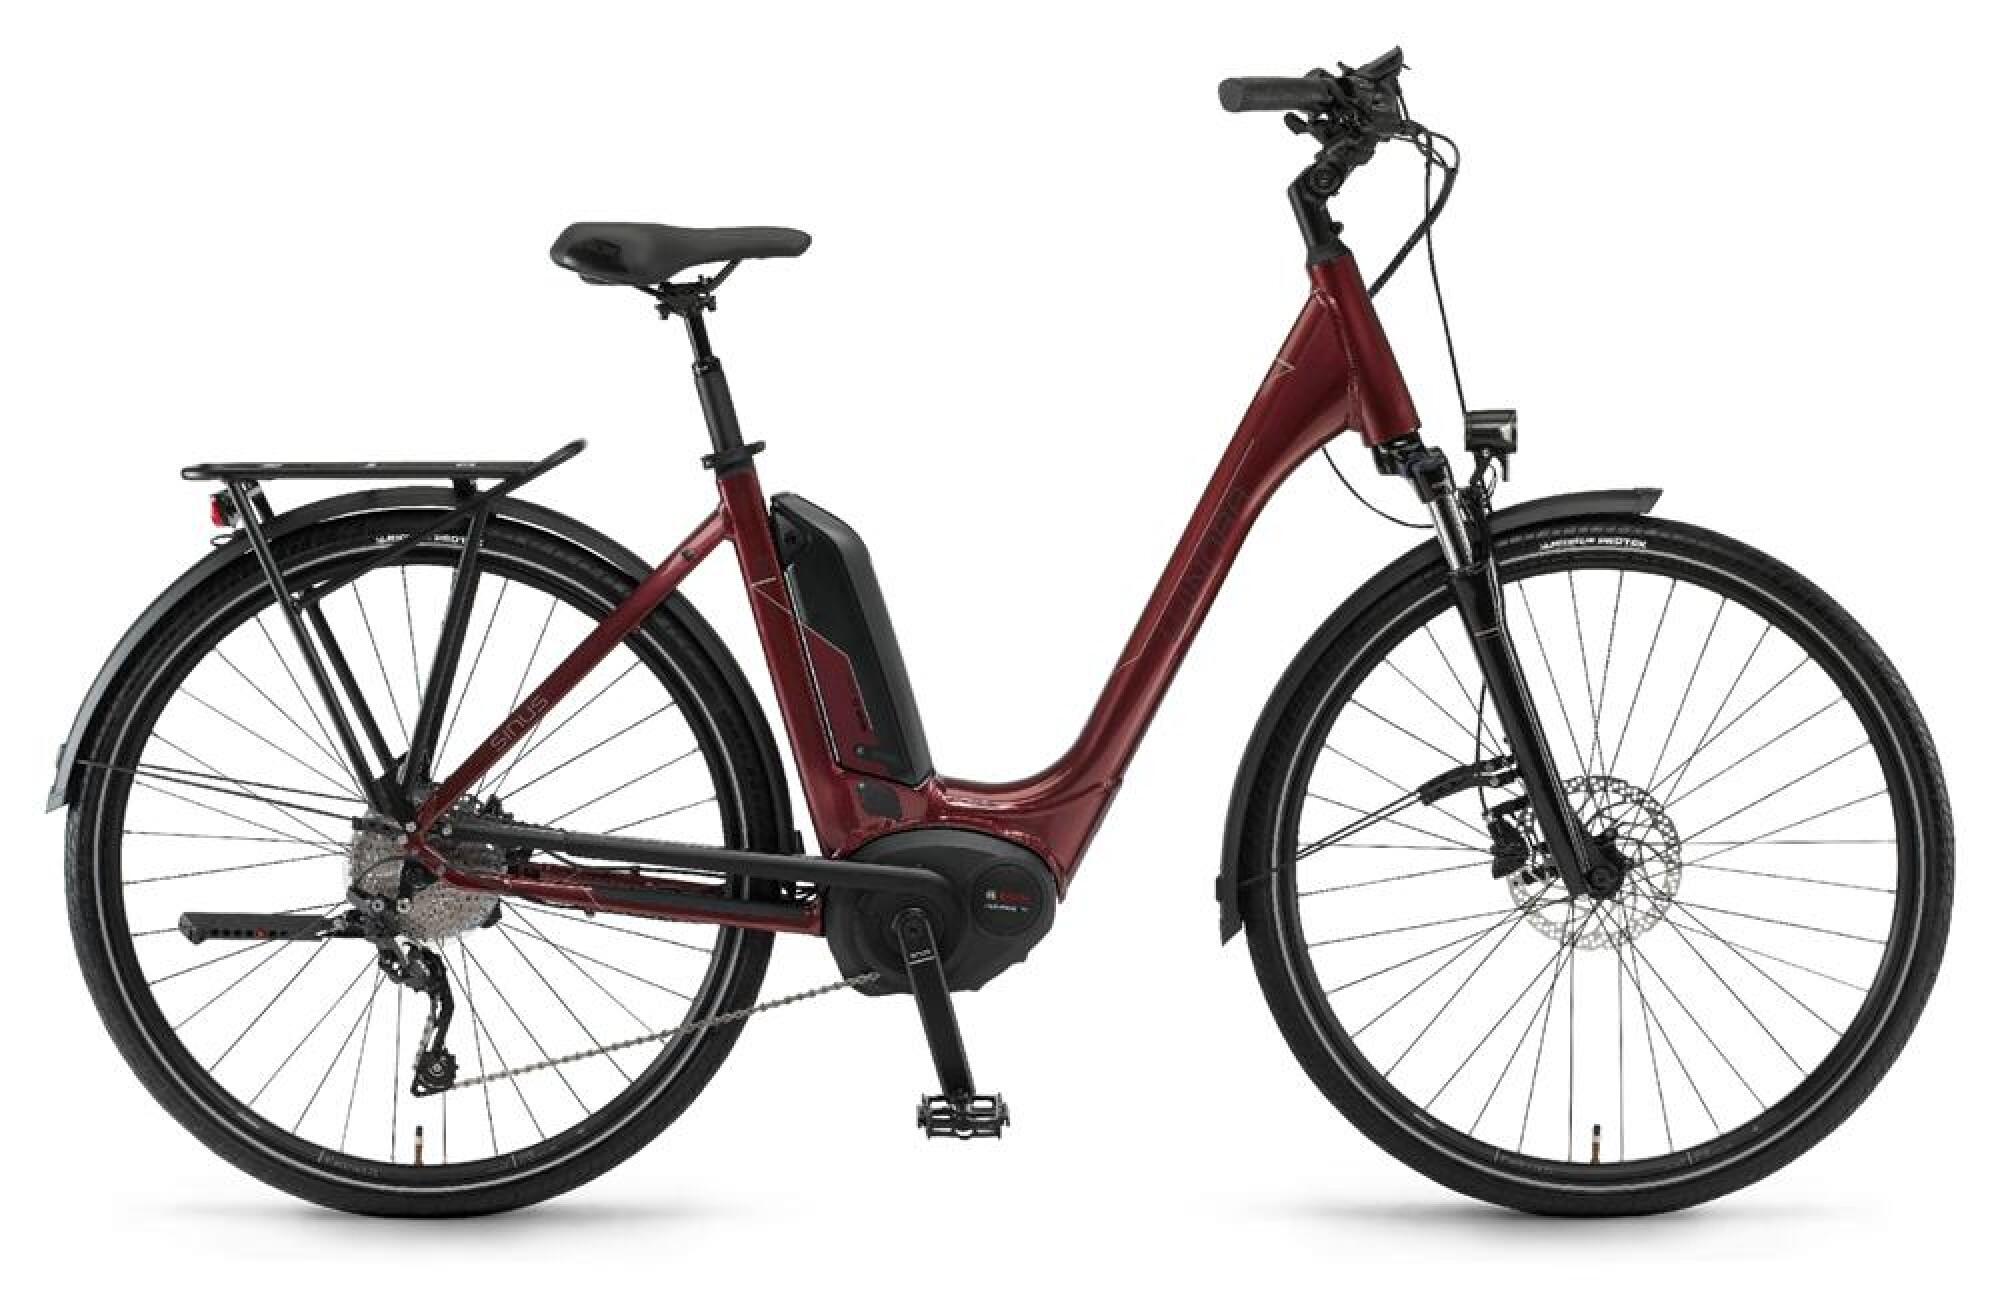 e bike winora sinus i10 2018 bei alle details. Black Bedroom Furniture Sets. Home Design Ideas